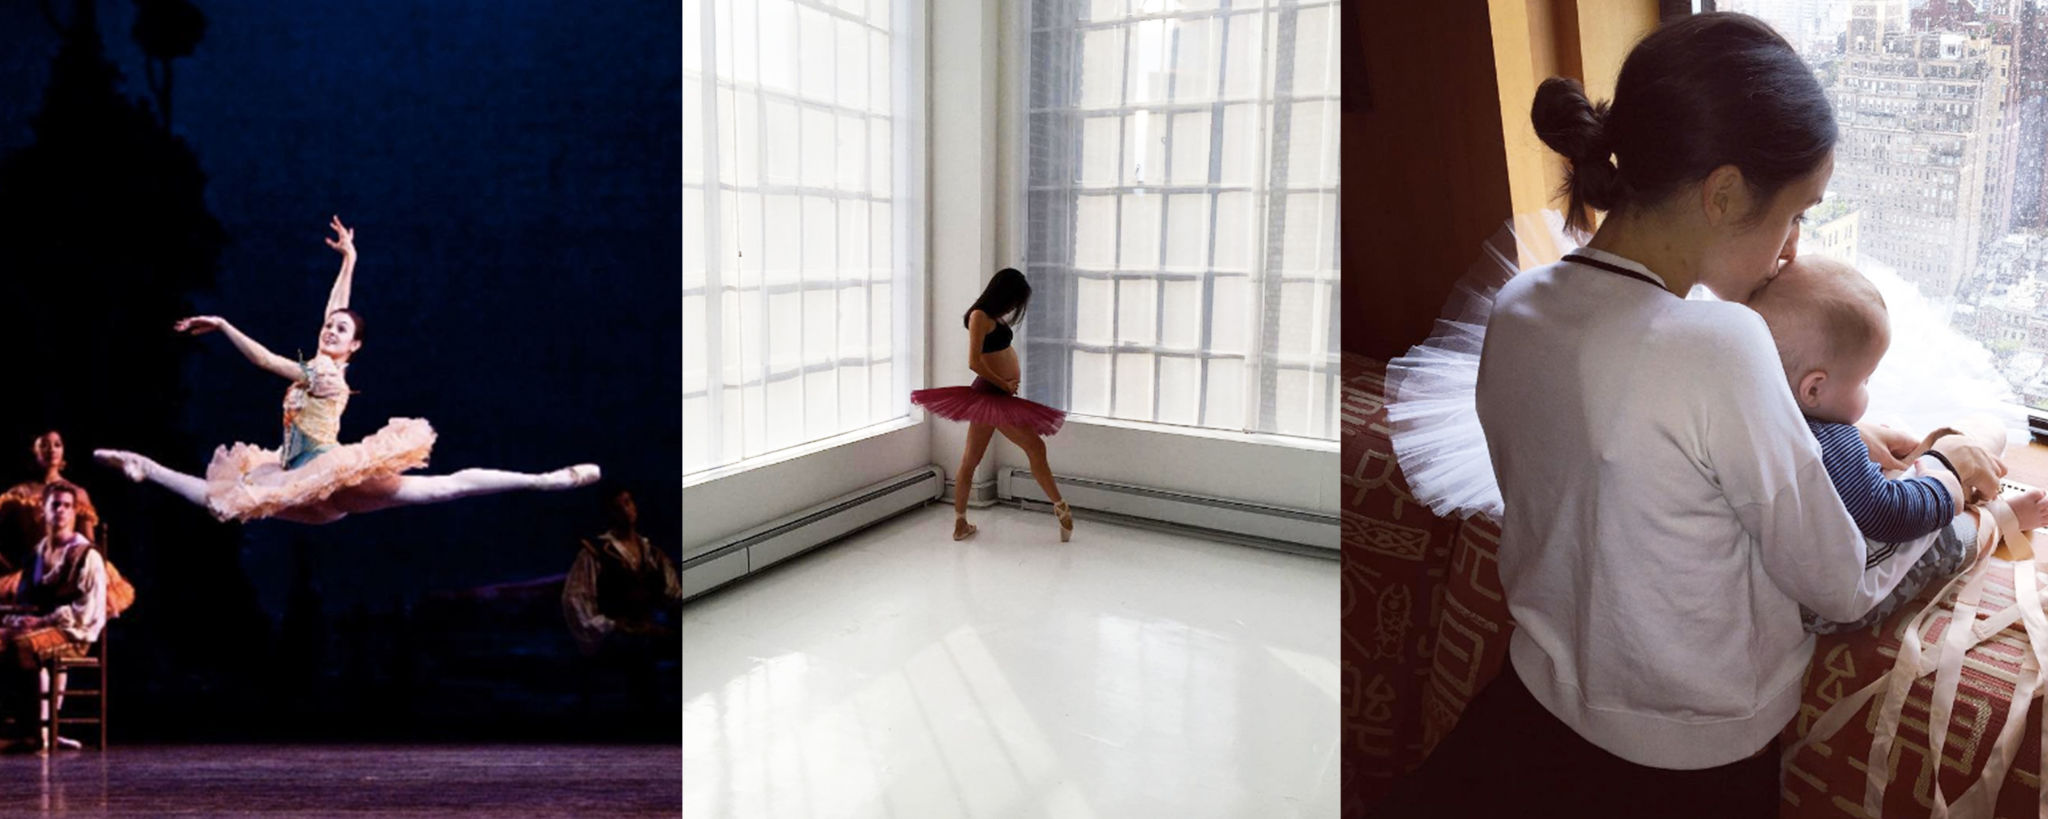 Pictures of melanie hamrick mick jagger s new girlfriend 43 years - Via Melanie Hamrick Melhamrick On Instagram